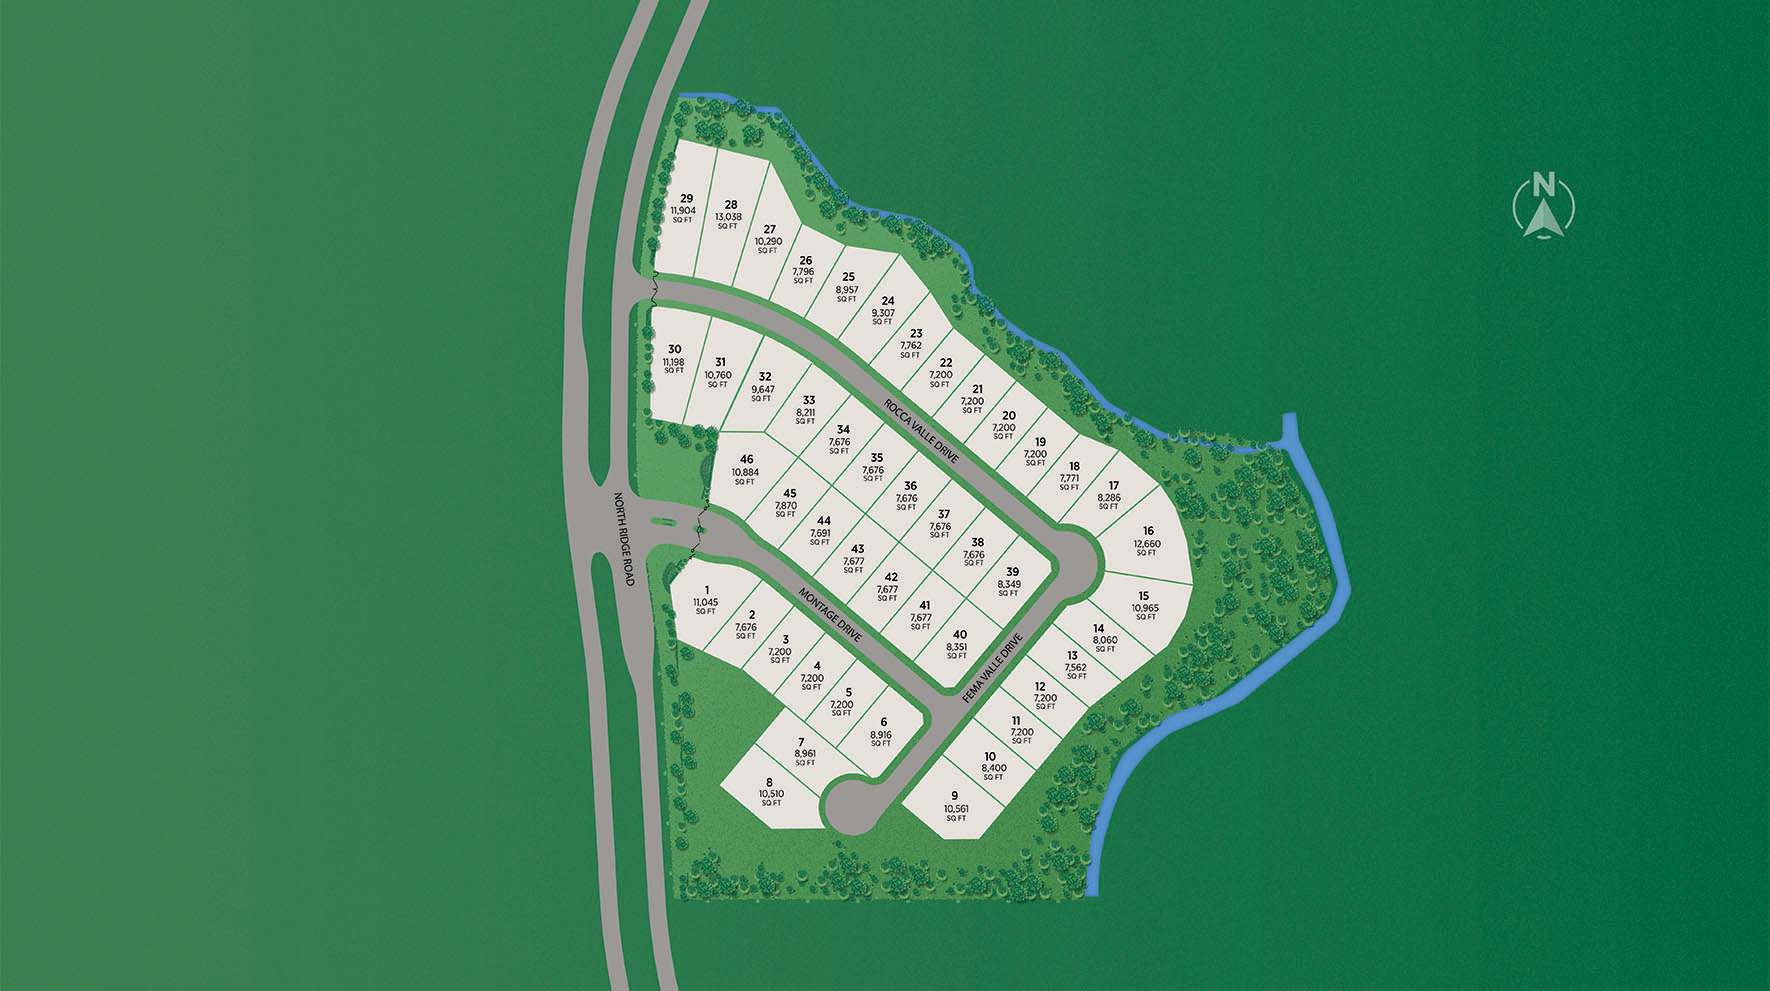 Paradiso Valle Site Plan